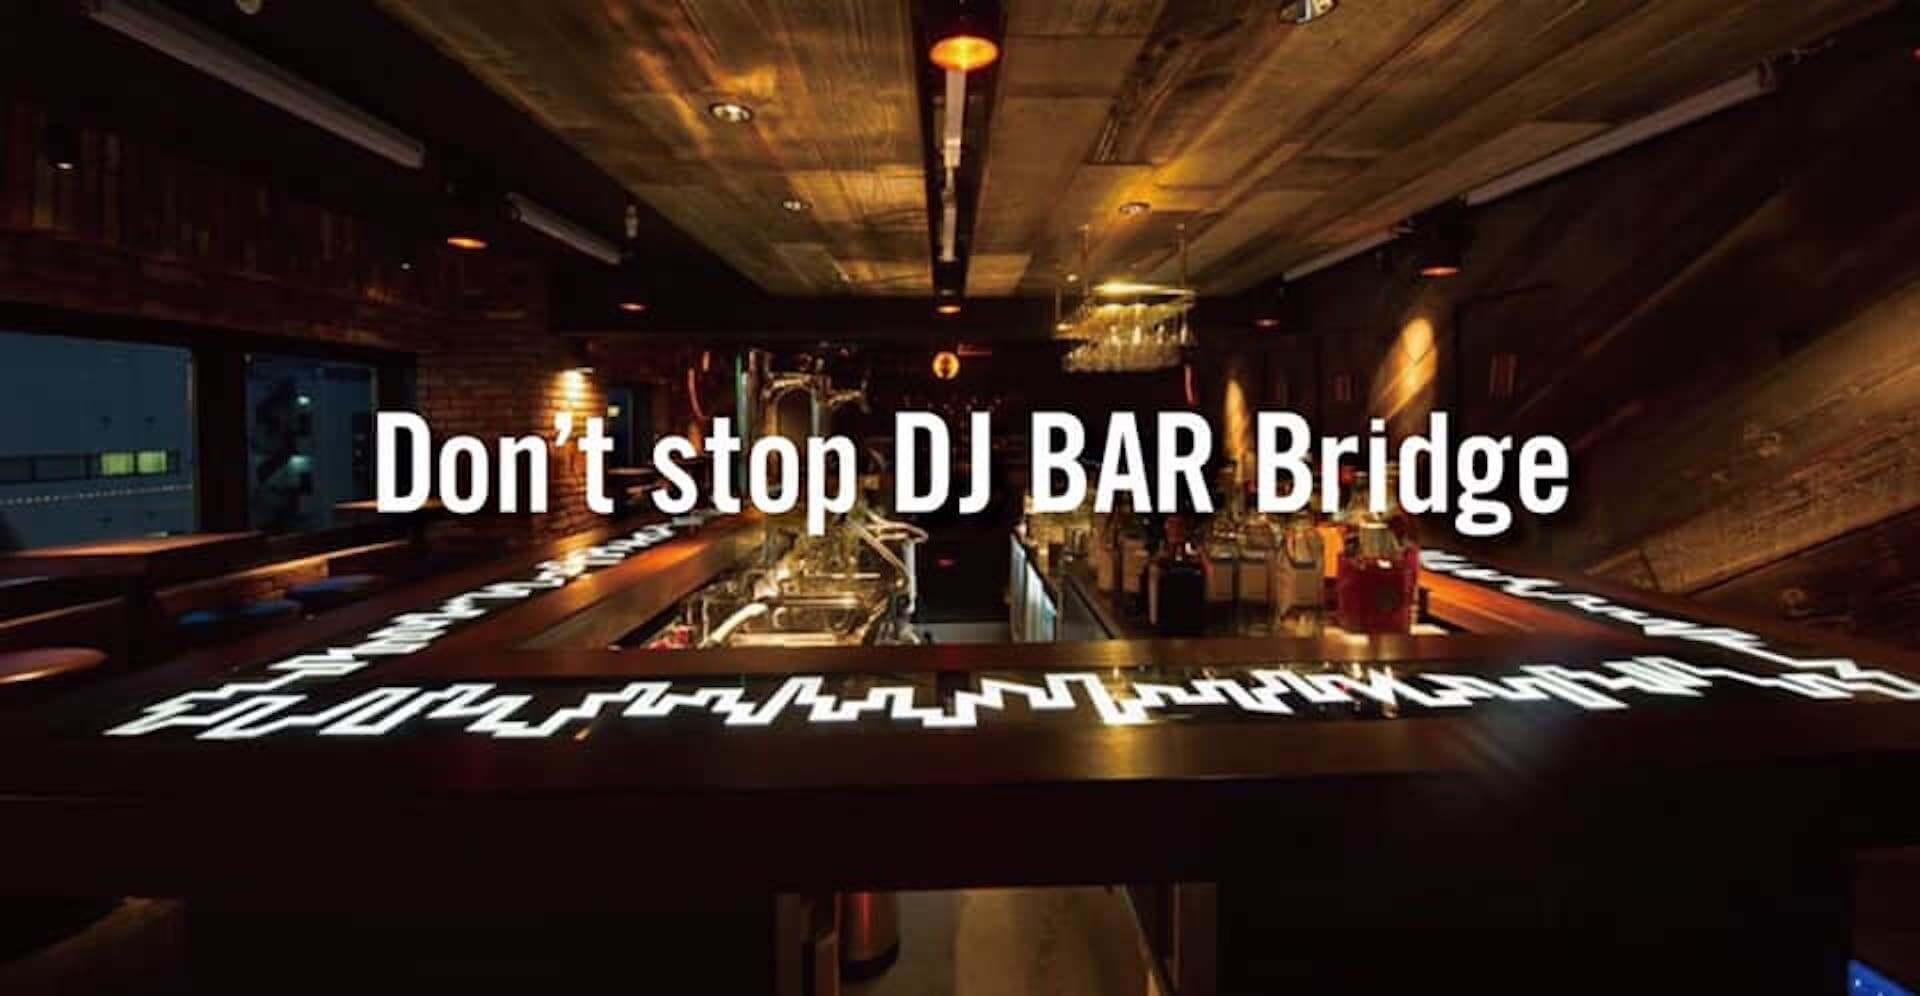 DJ BAR Bridgeが、店舗存続のための緊急支援をクラウドファンディングで募集中!リターンには非売品Tシャツも music200525_bridge_fire_01-1920x996